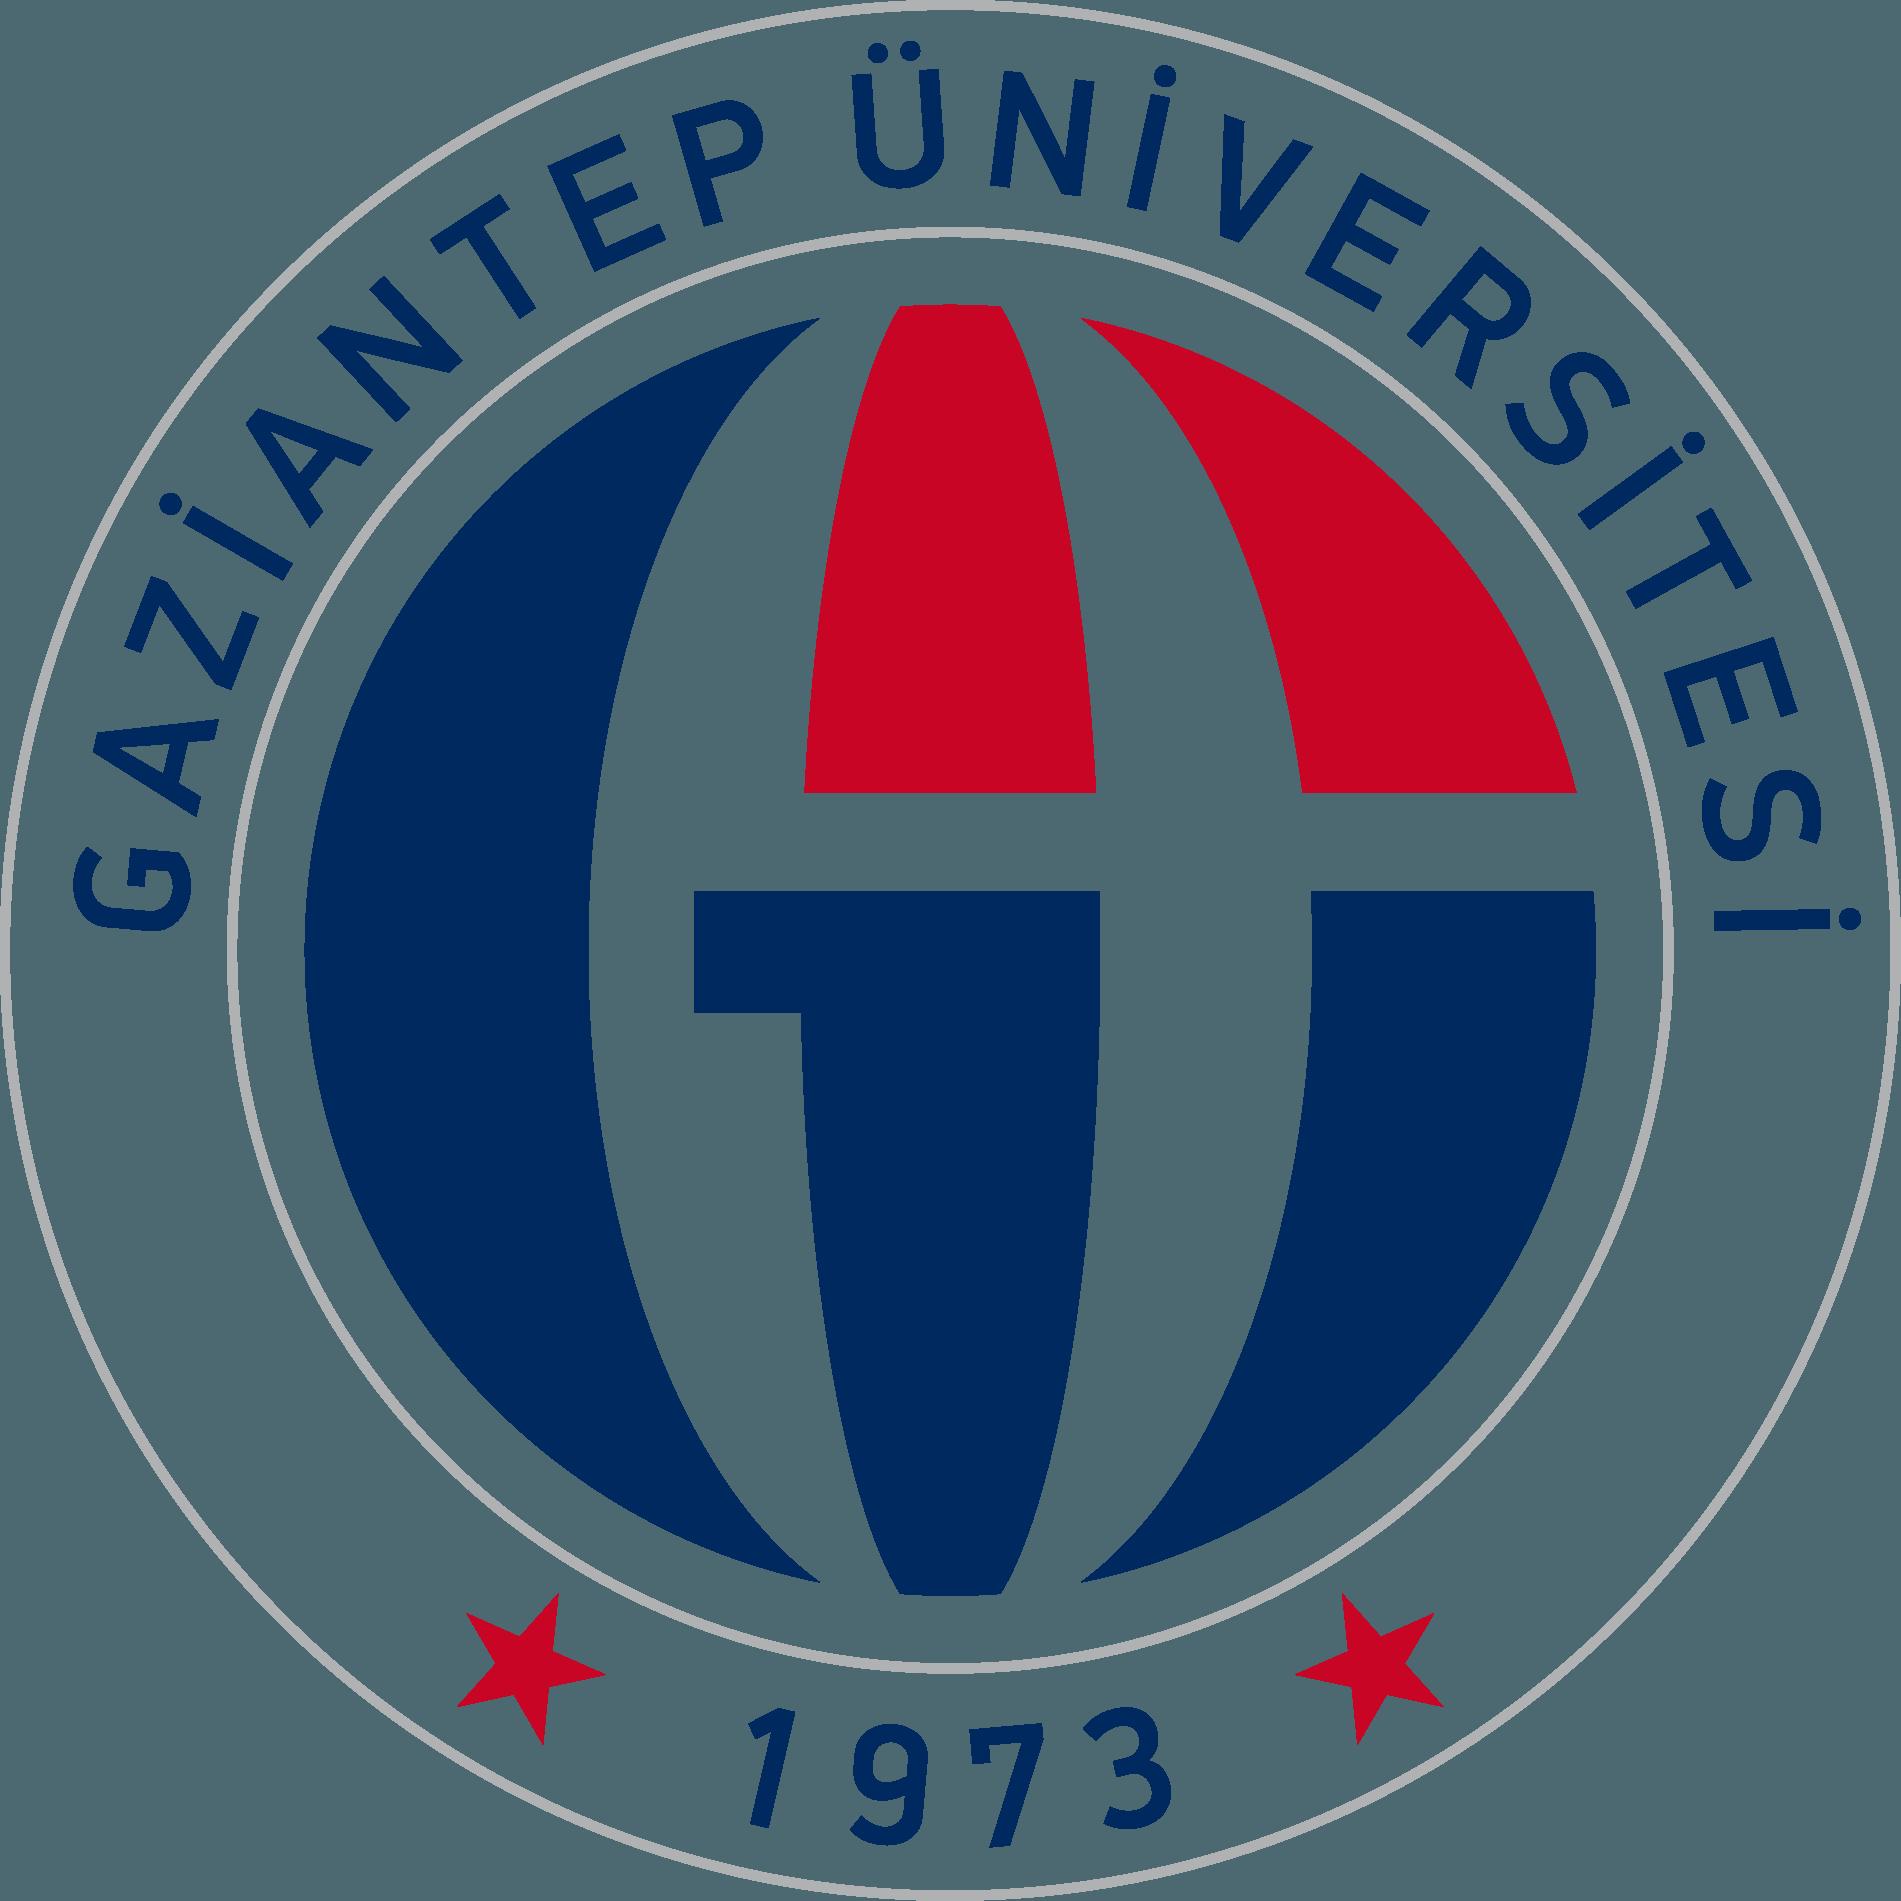 Gaziantep Üniversitesi Logo png